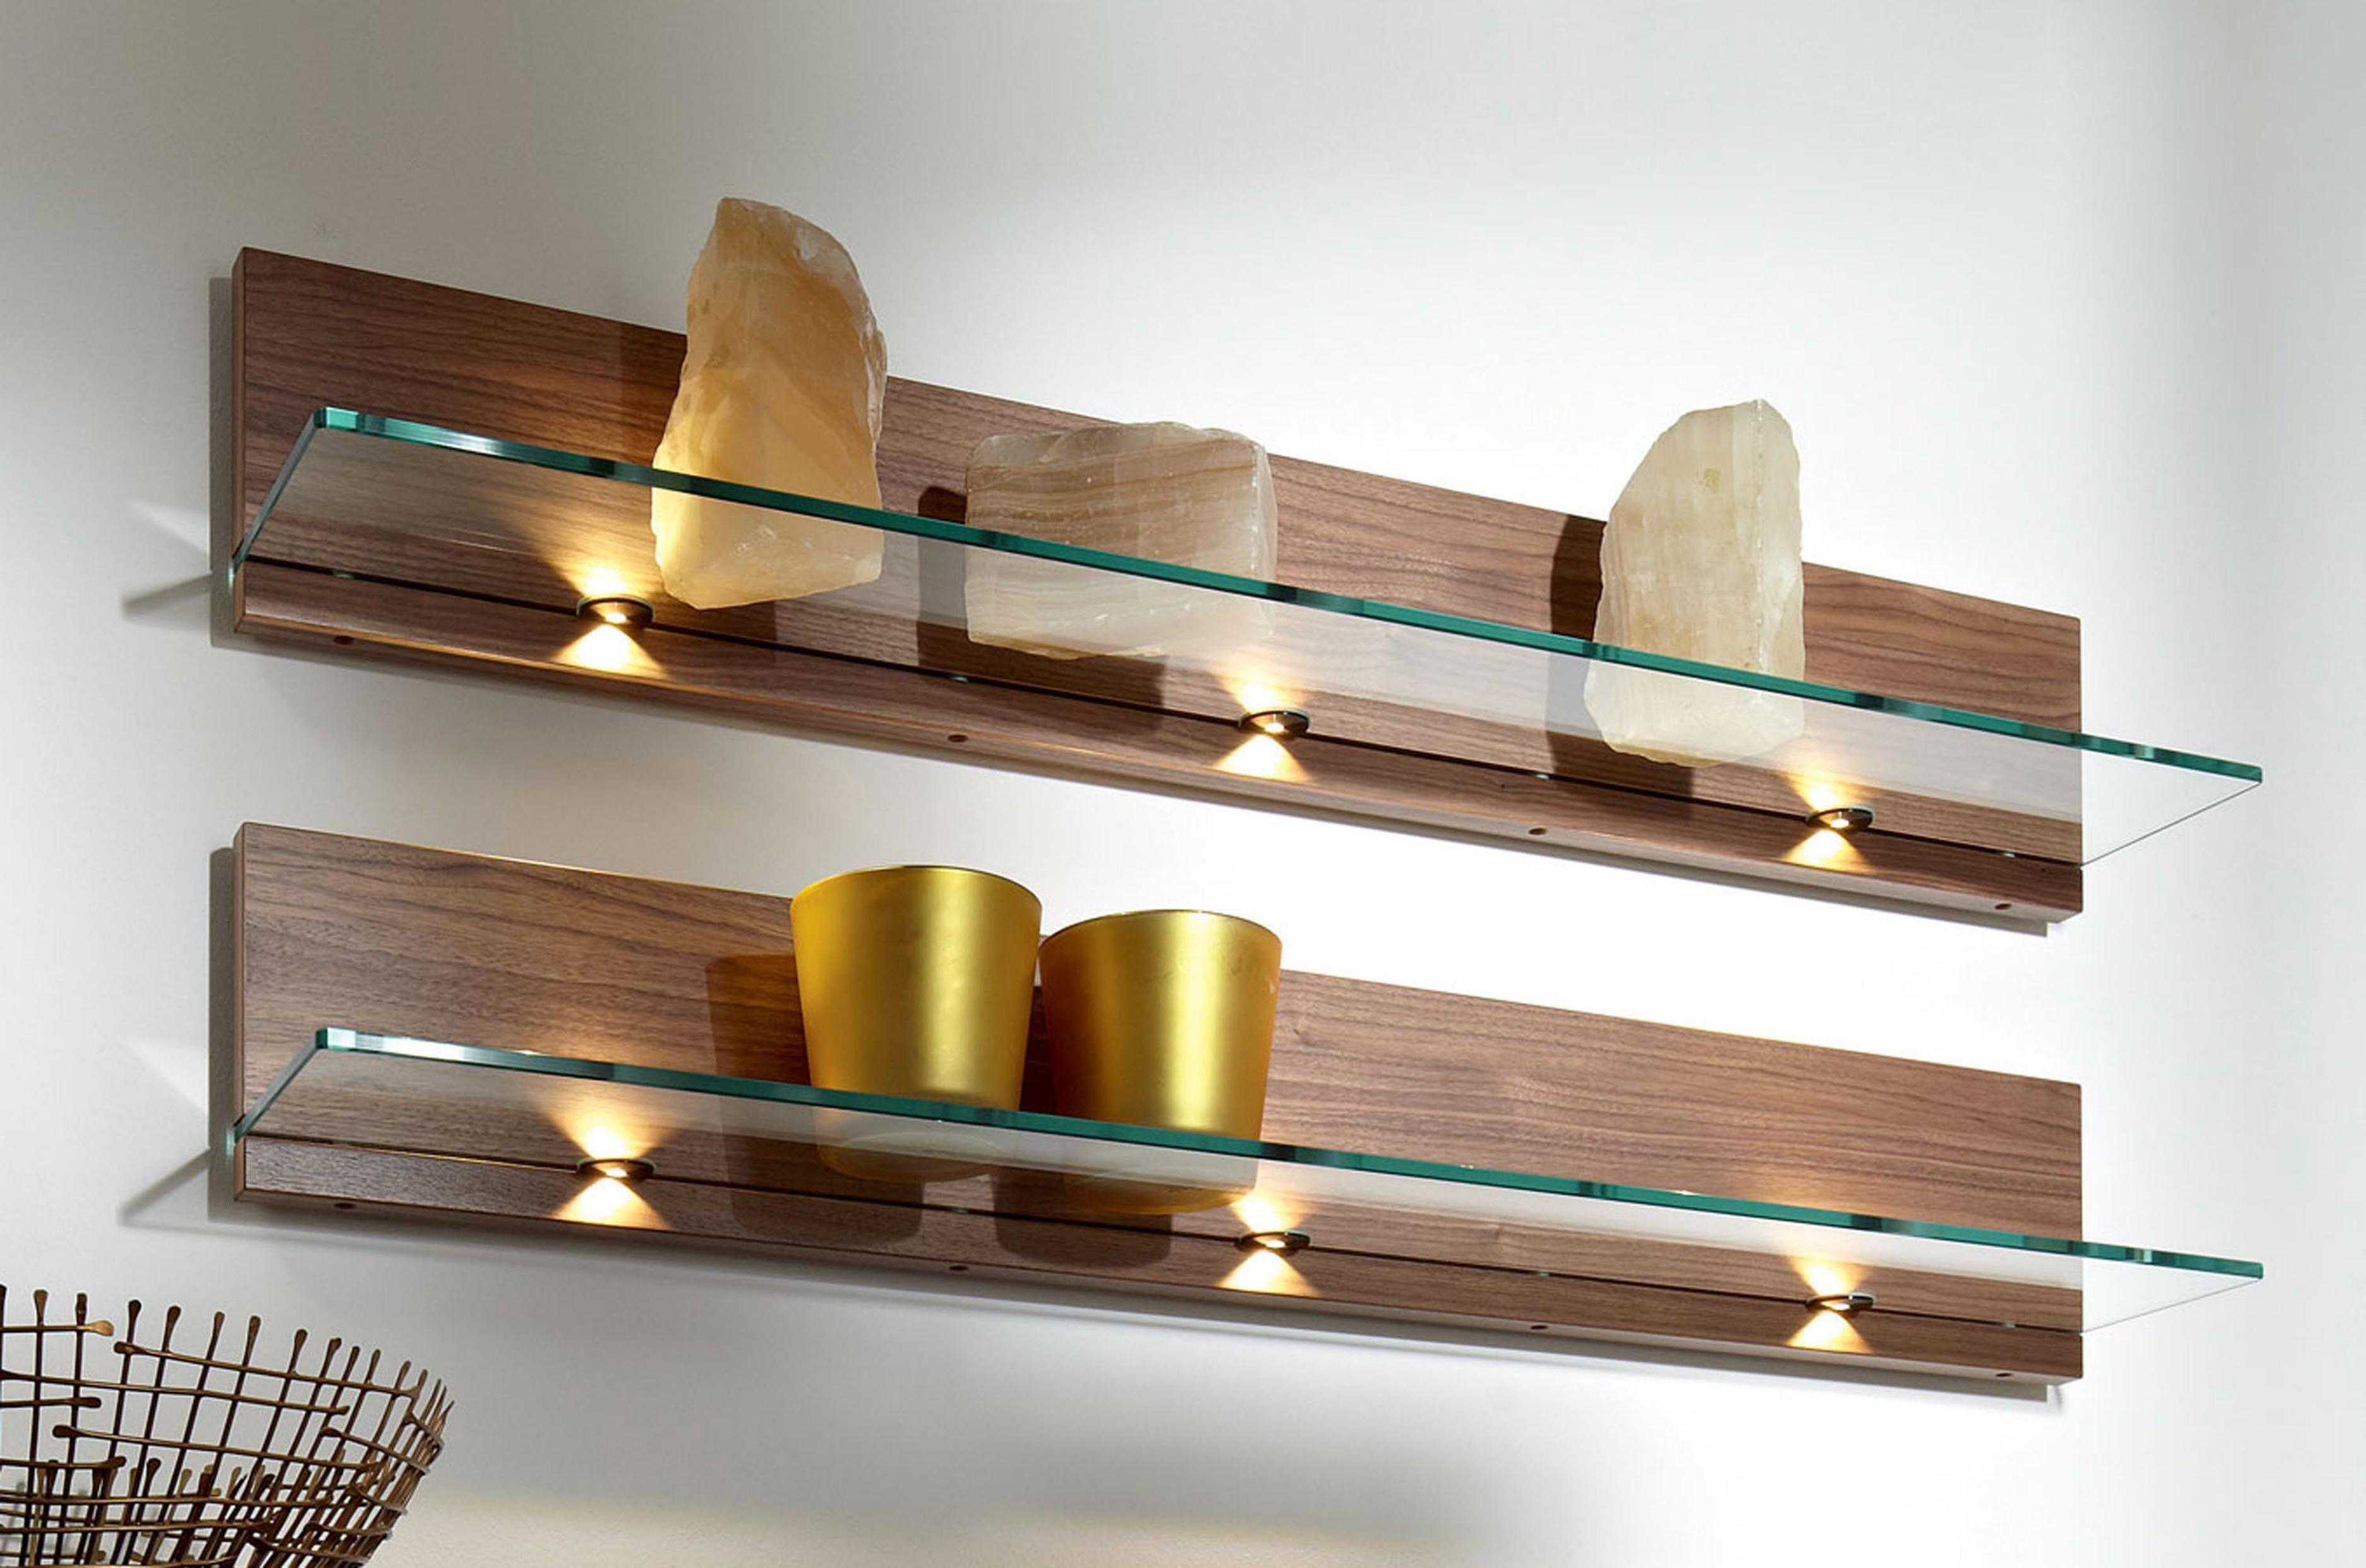 20 Top Decorative Floating Wall Shelves Design Floating Glass Shelves Floating Shelves Wall Mounted Shelves